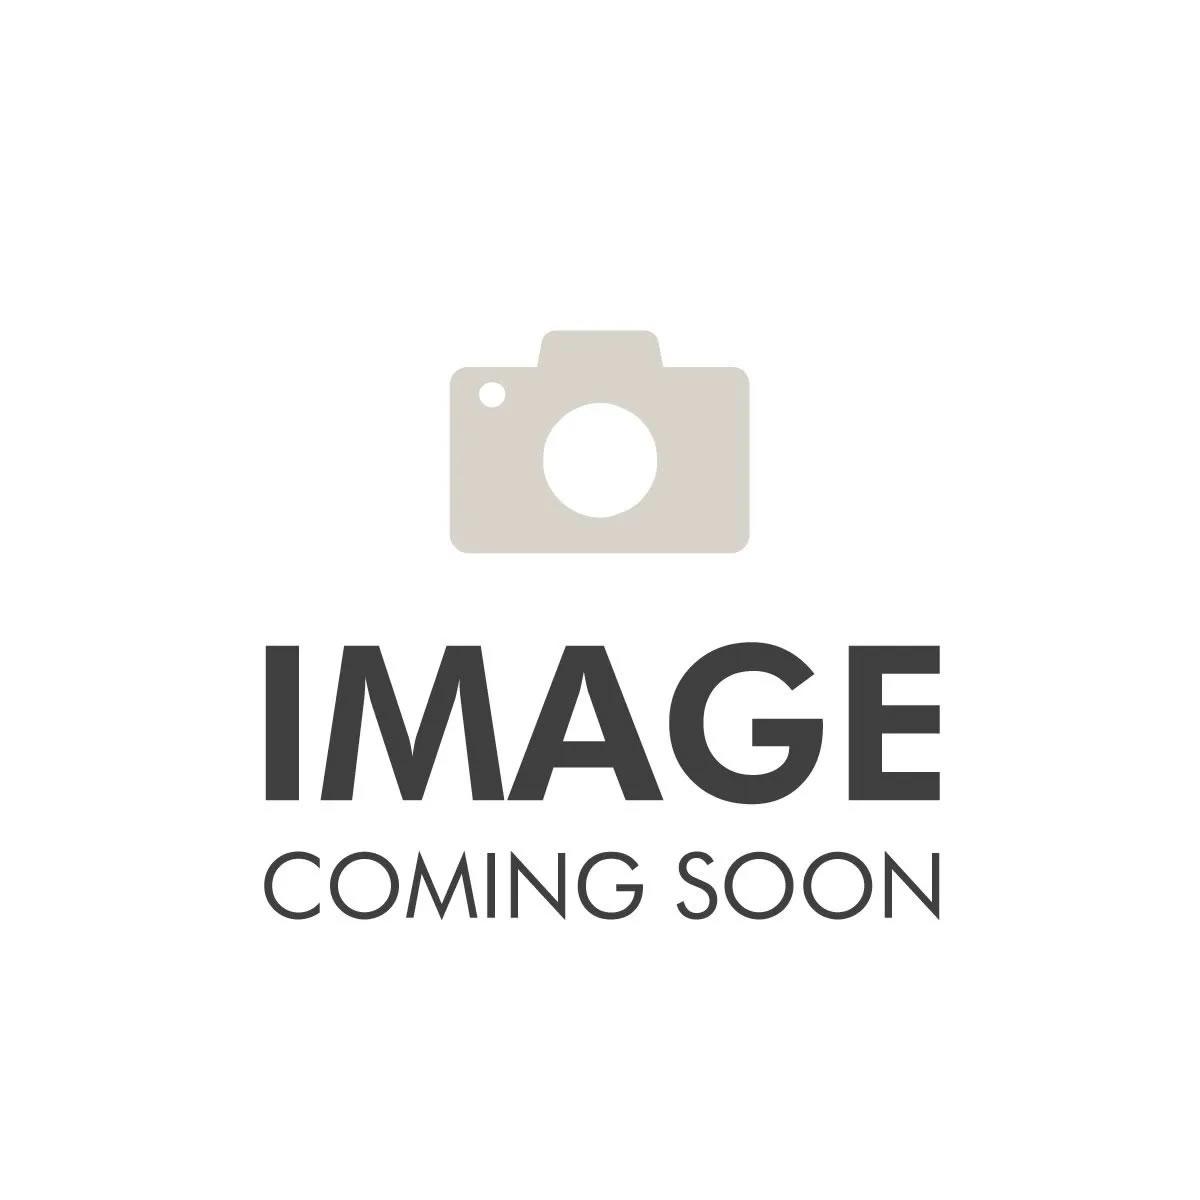 A-Pillar 4 Switch Pod Kit Black Right Side 07-10 Jeep JK Wrangler